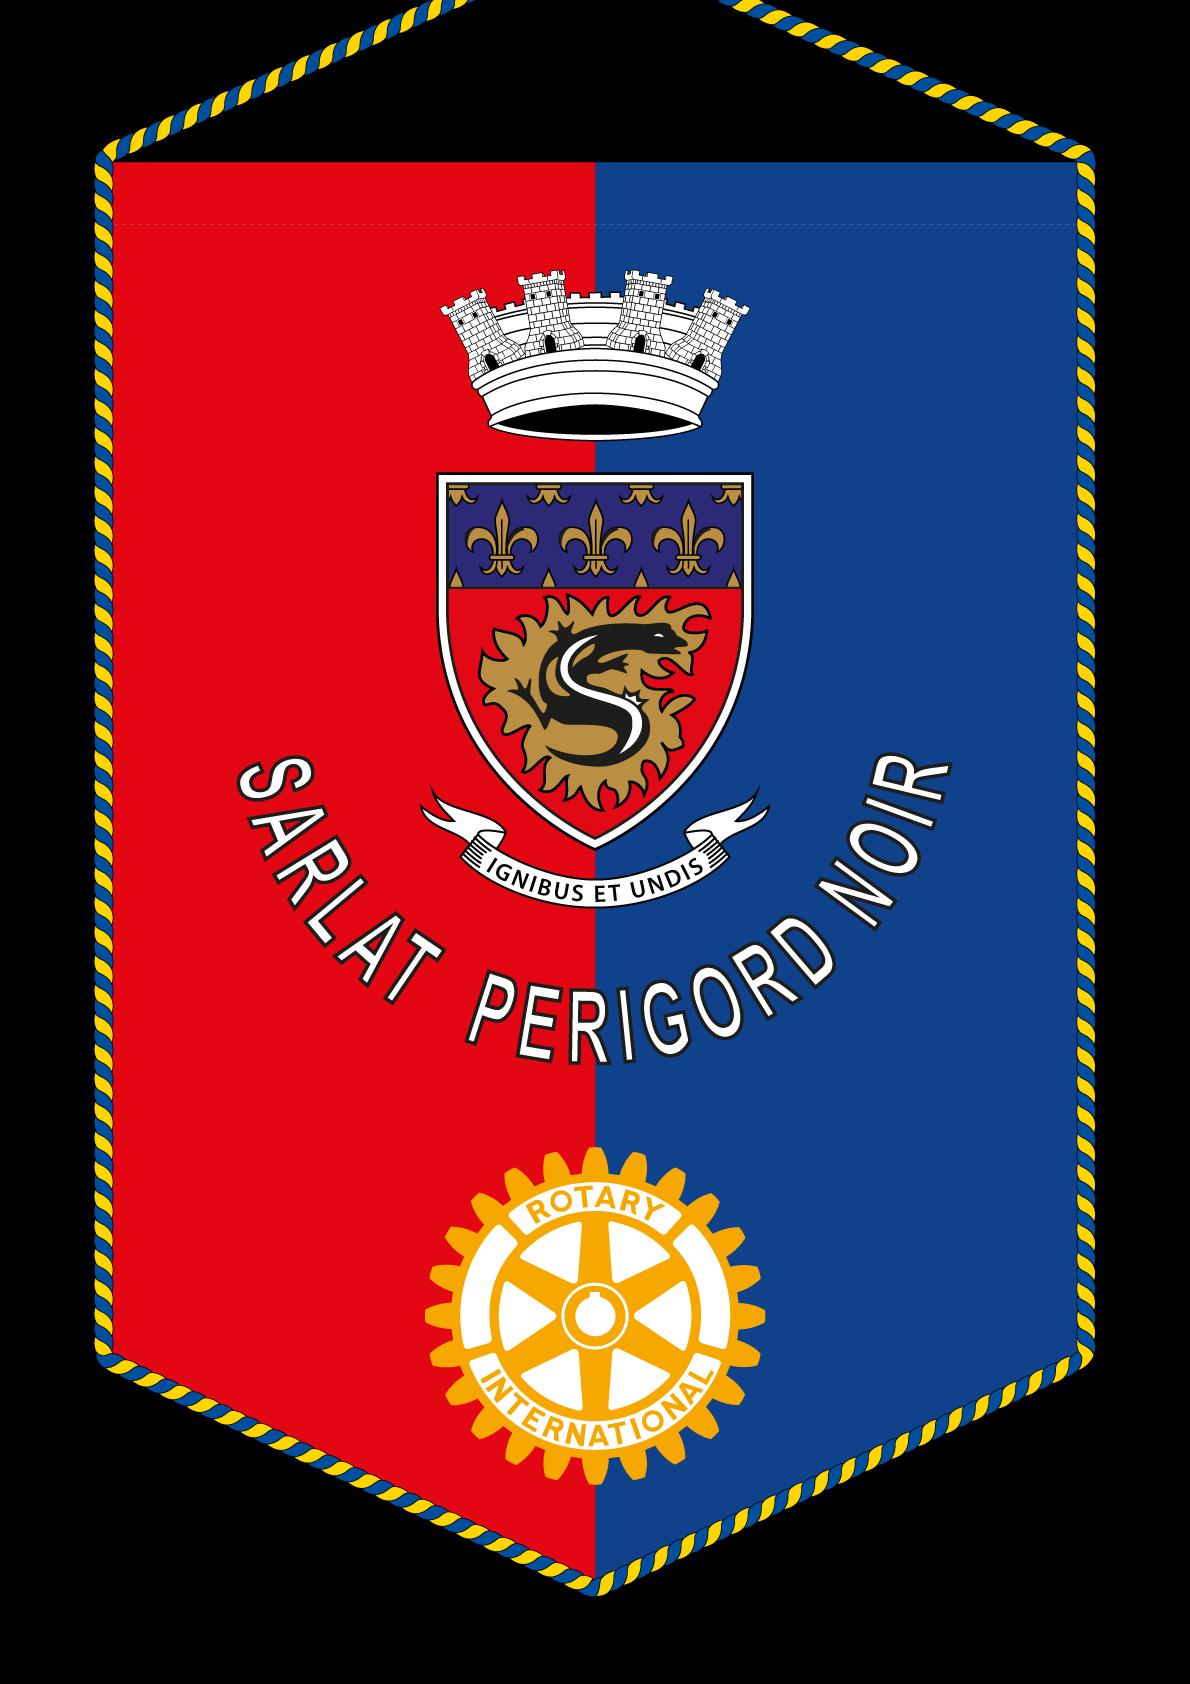 FANION ROTARY CLUB SARLAT PERIGORD NOIR